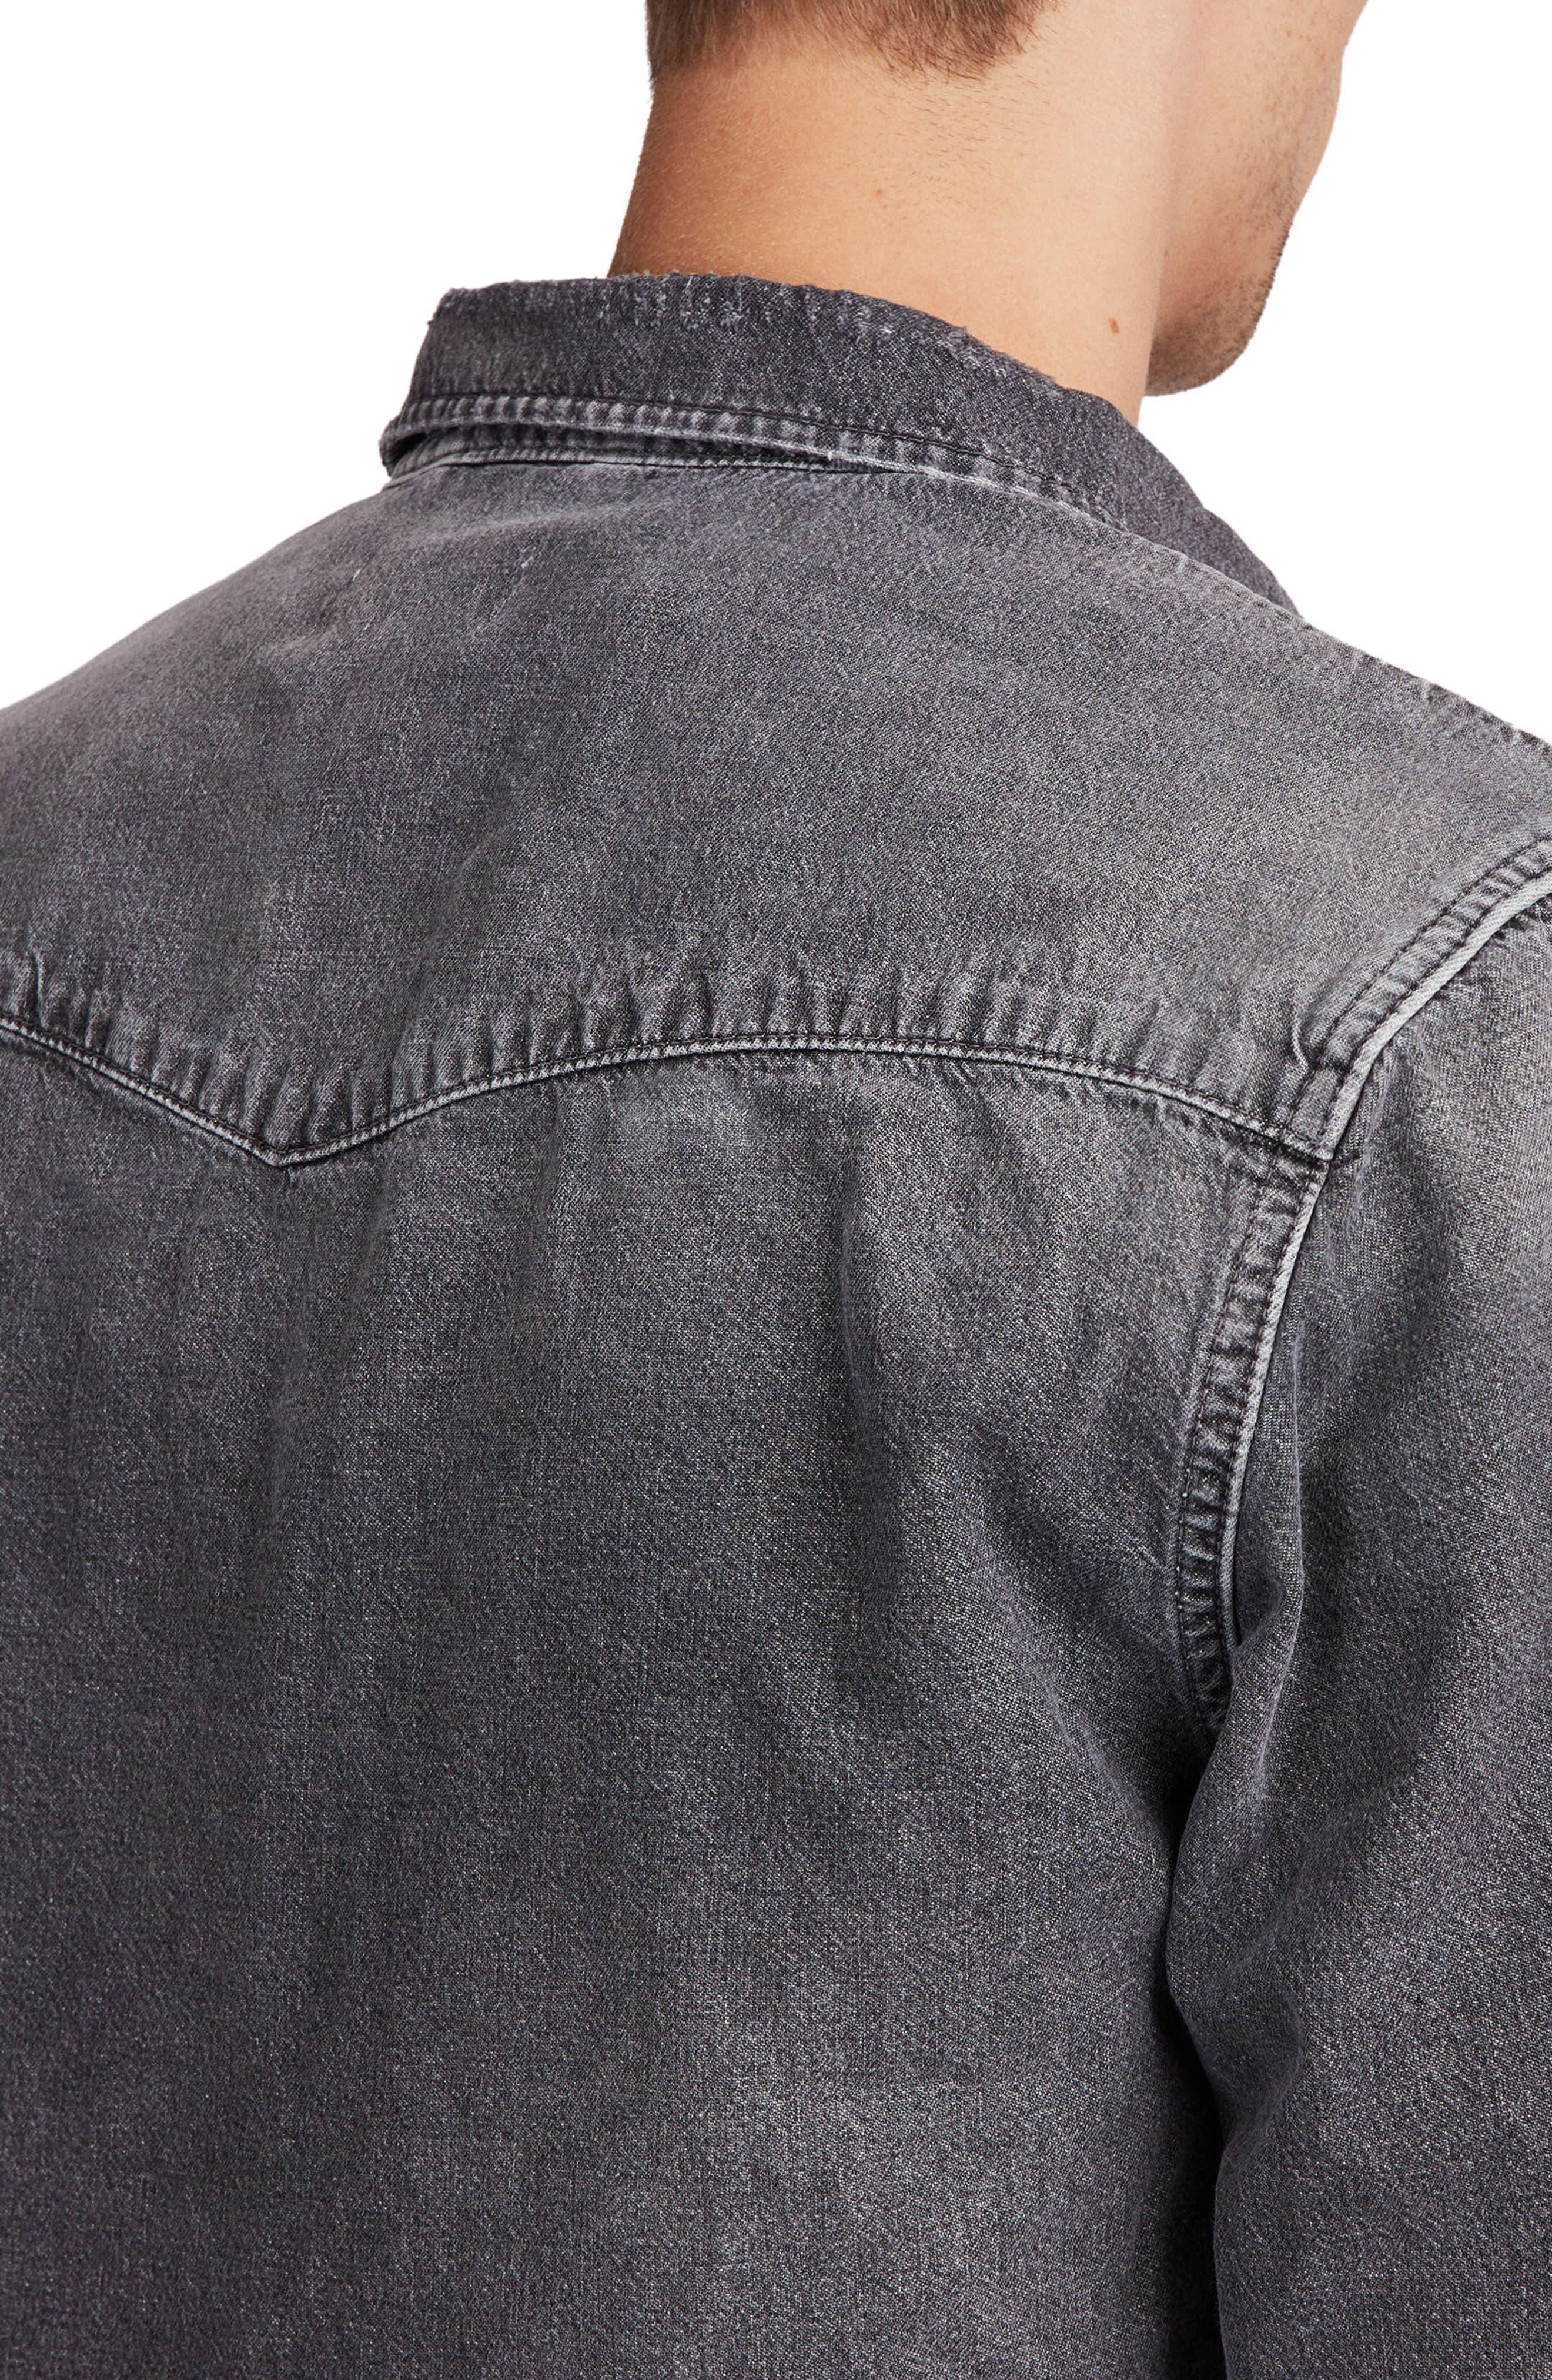 Beegan Distressed Denim Shirt Jacket,                             Alternate thumbnail 2, color,                             Black